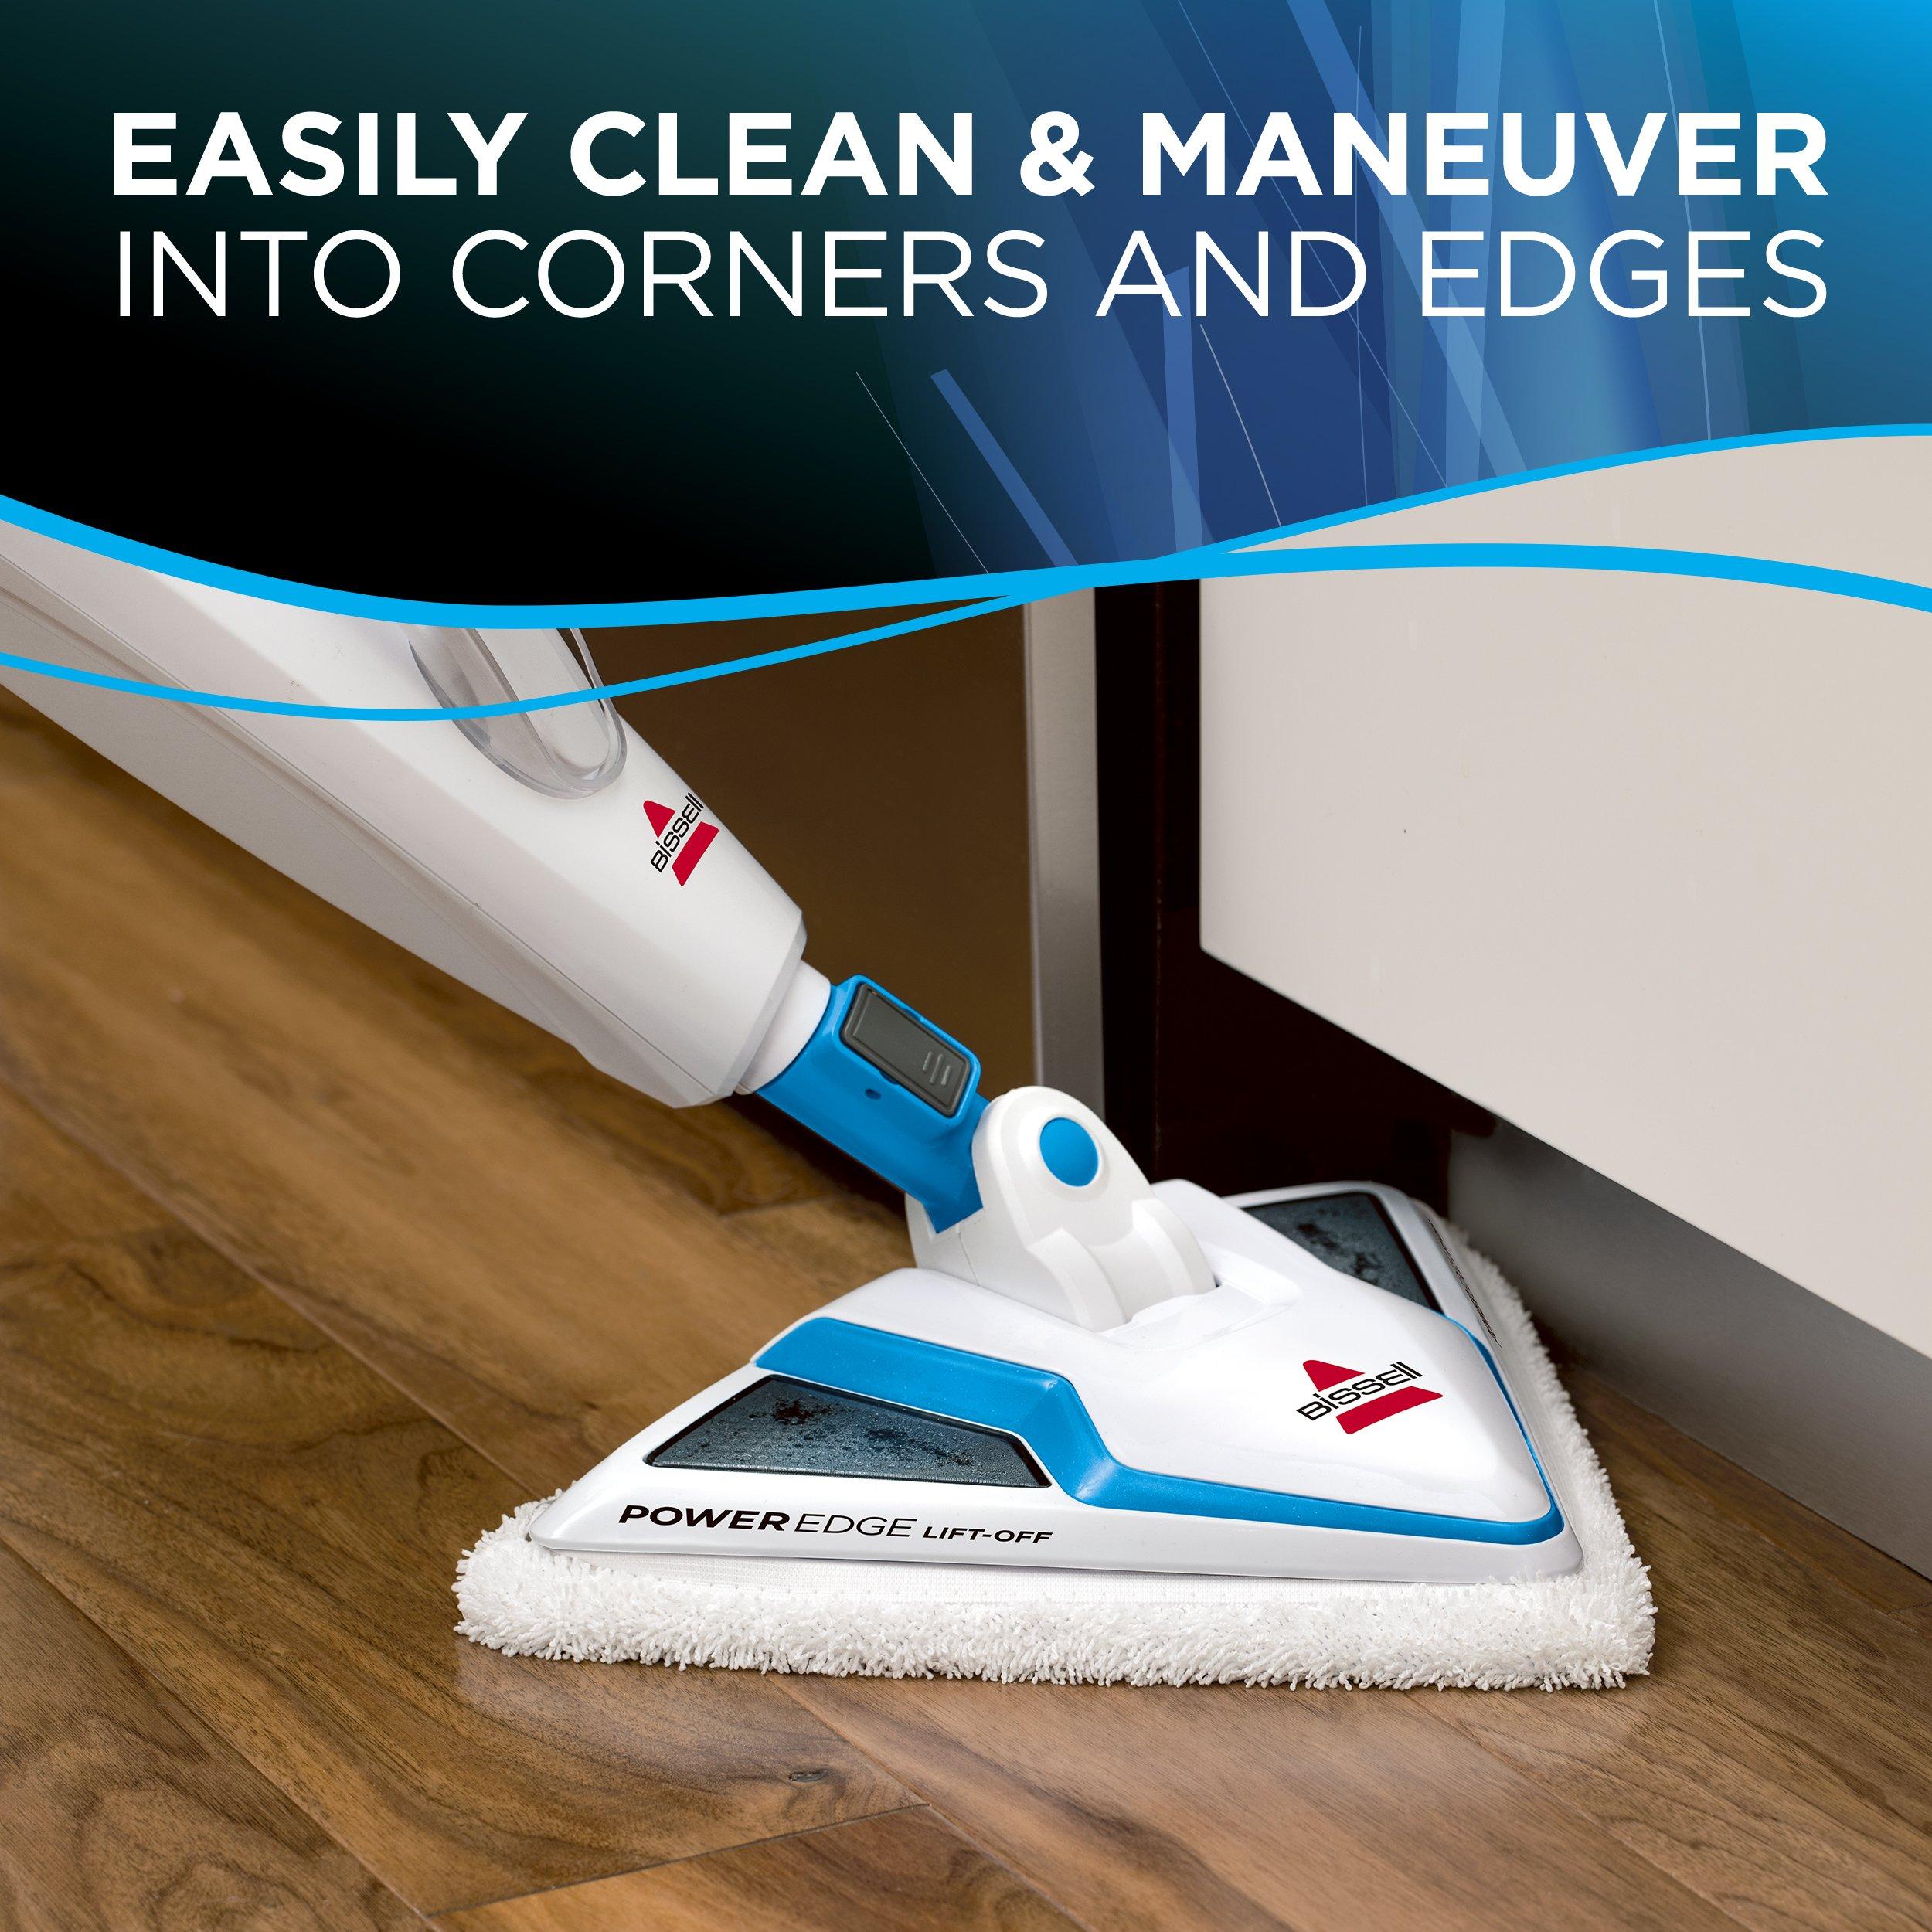 Bissell Poweredge Lift Off Hard Wood Floor Cleaner Tile Cleaner